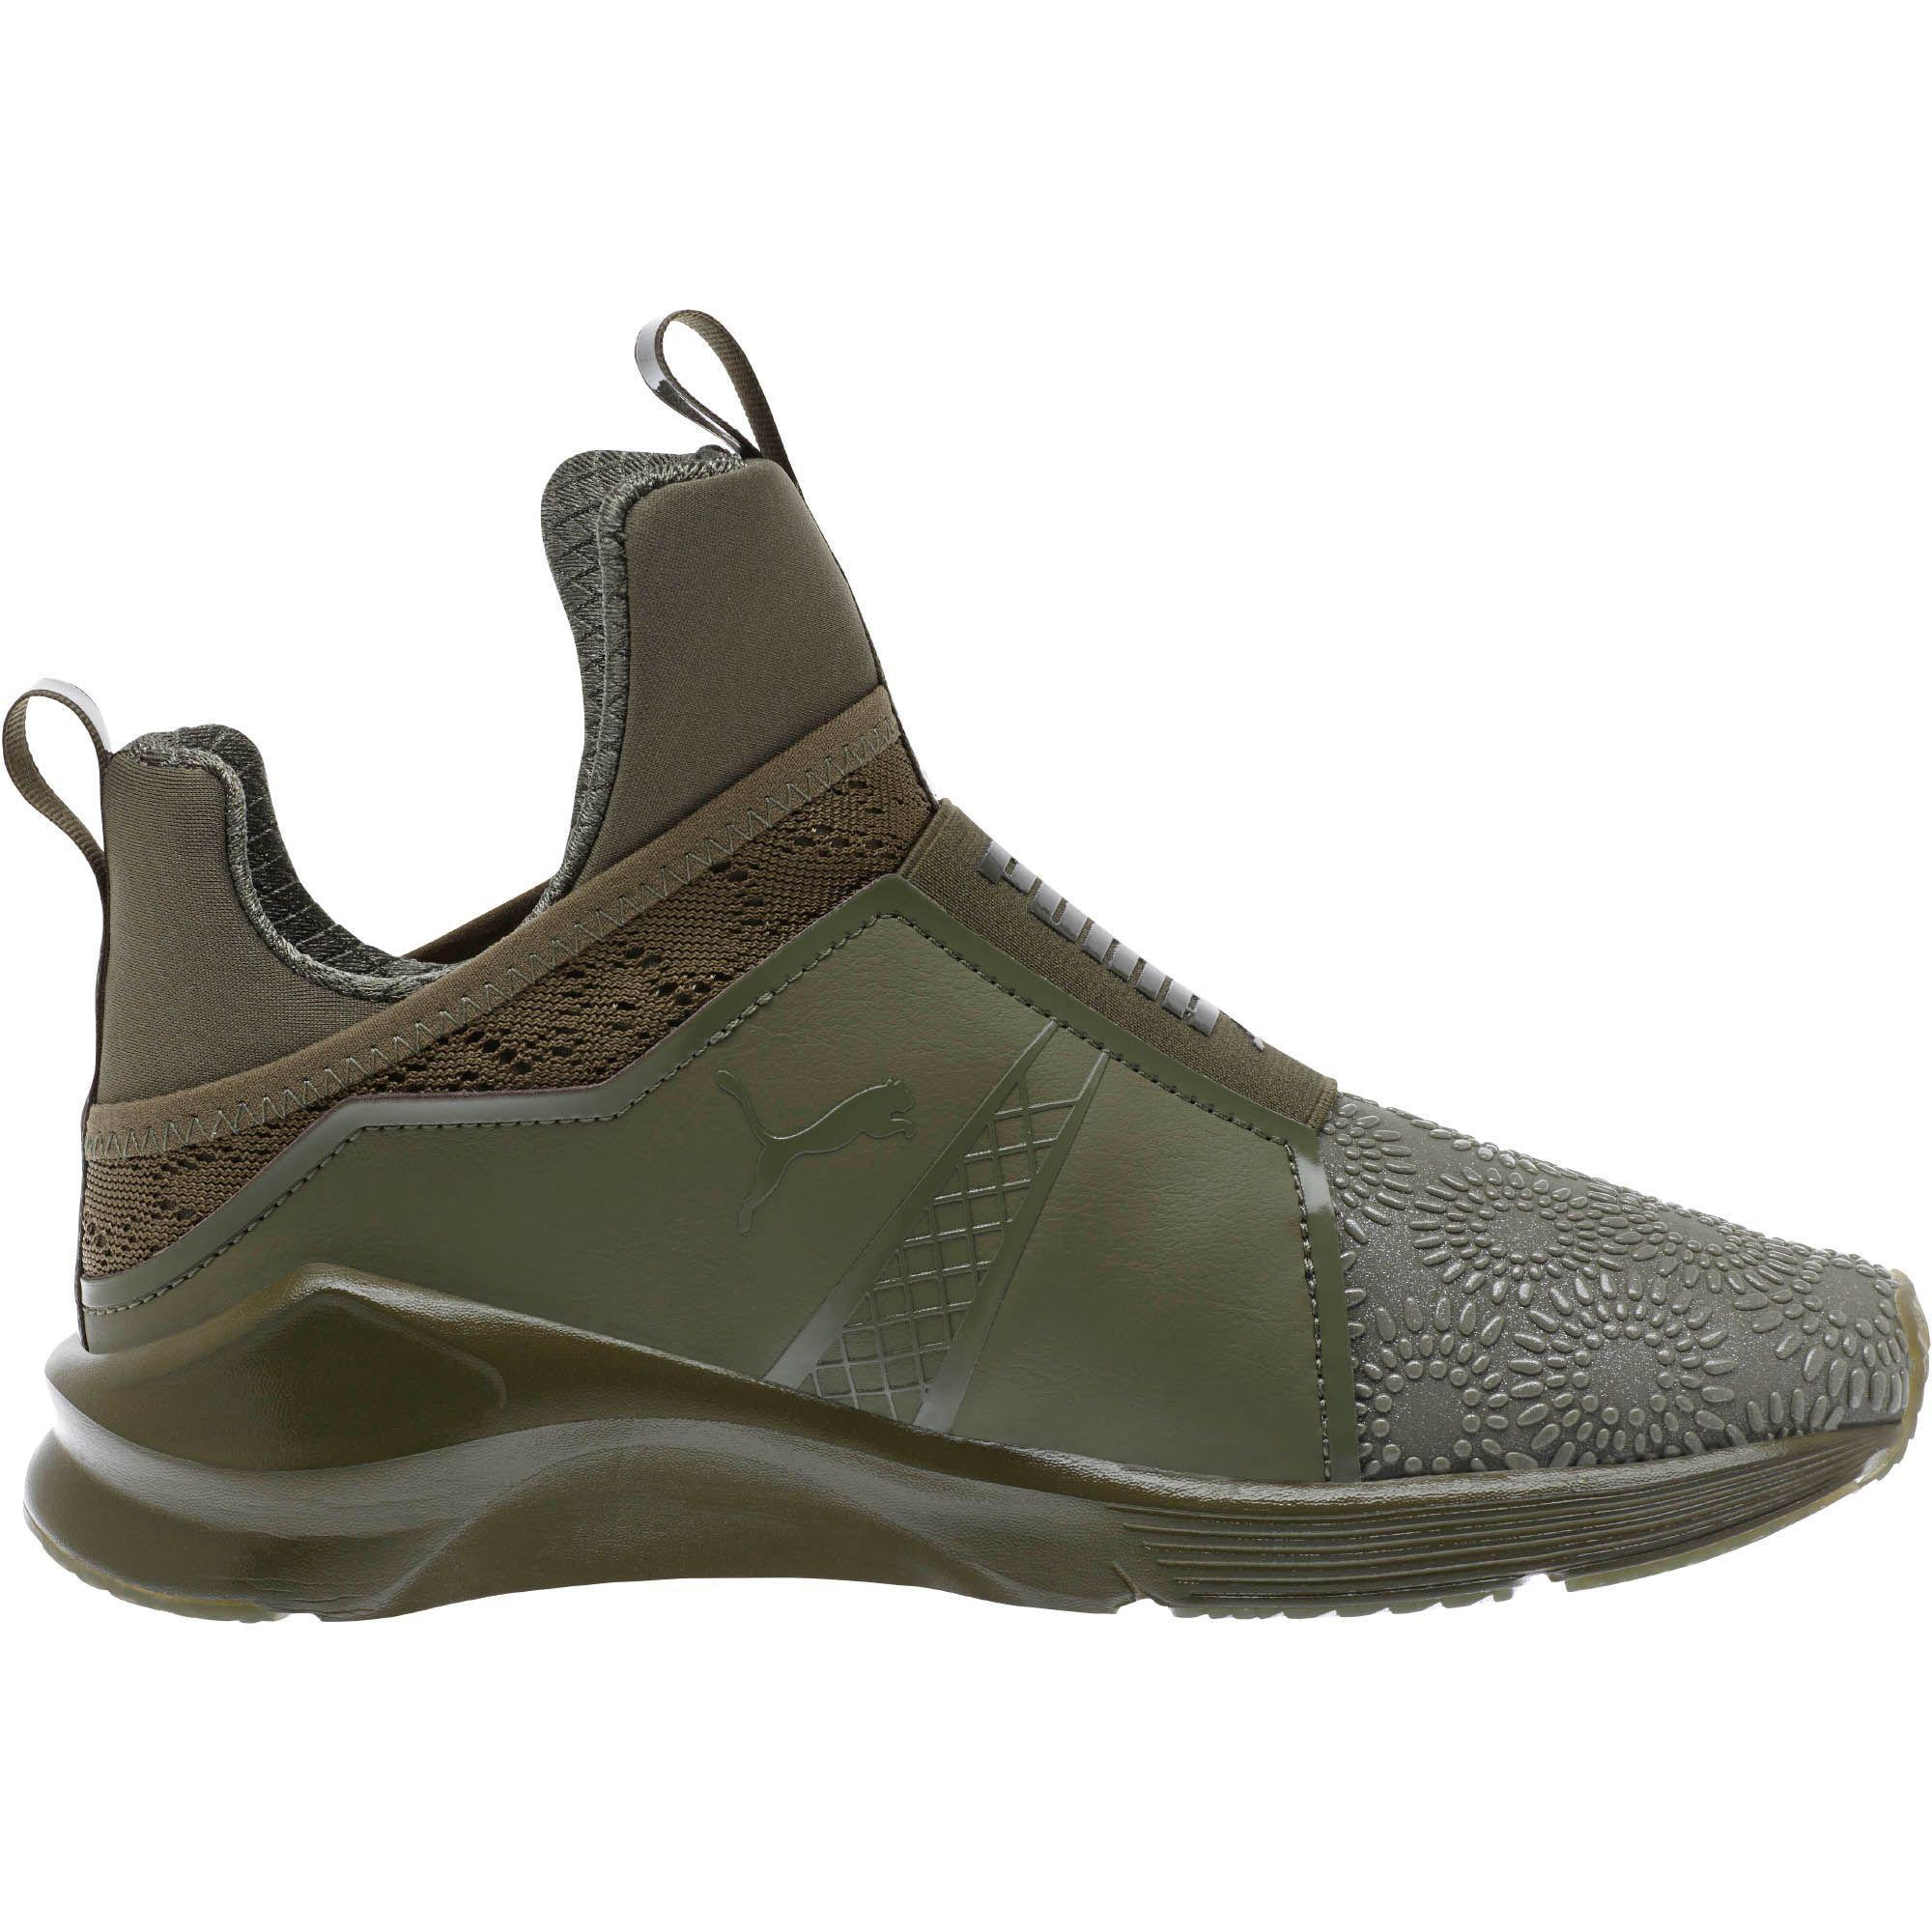 bdf59d60302 Lyst - PUMA Fierce Kurim Women s Training Shoes in Green